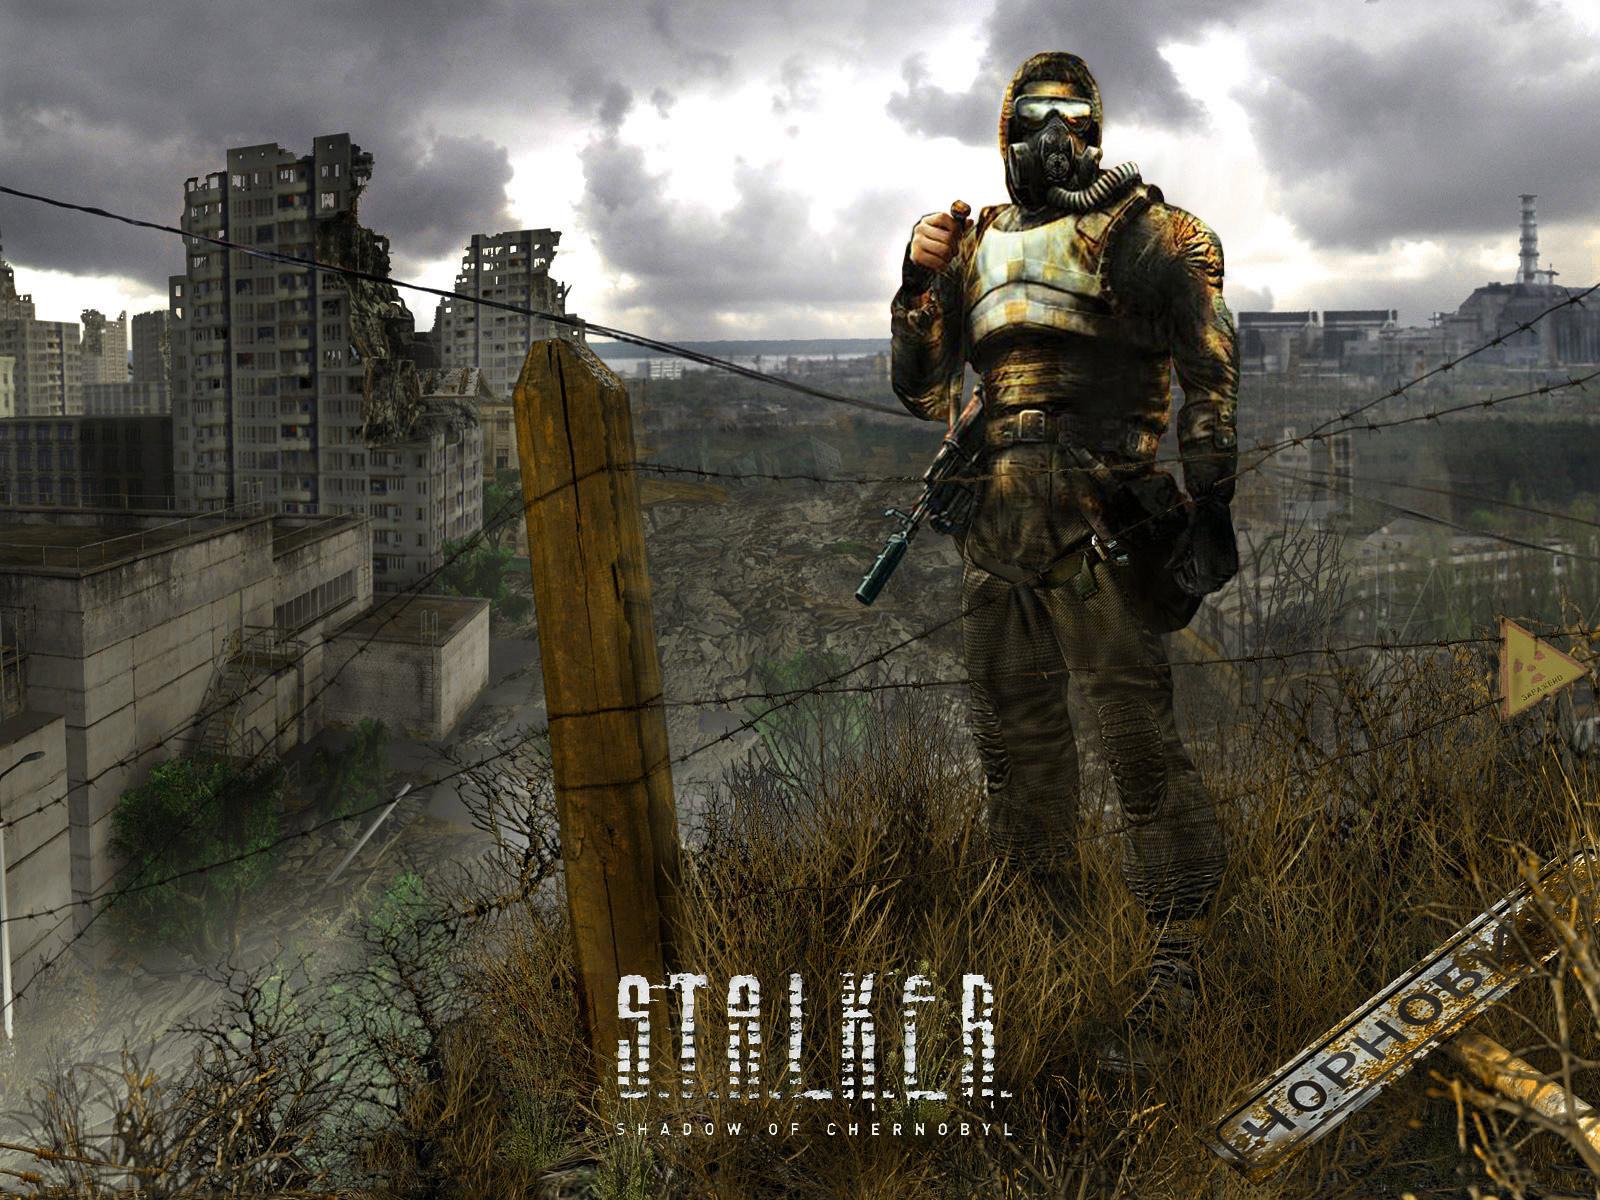 S.T.A.L.K.E.R Тень Чернобыля